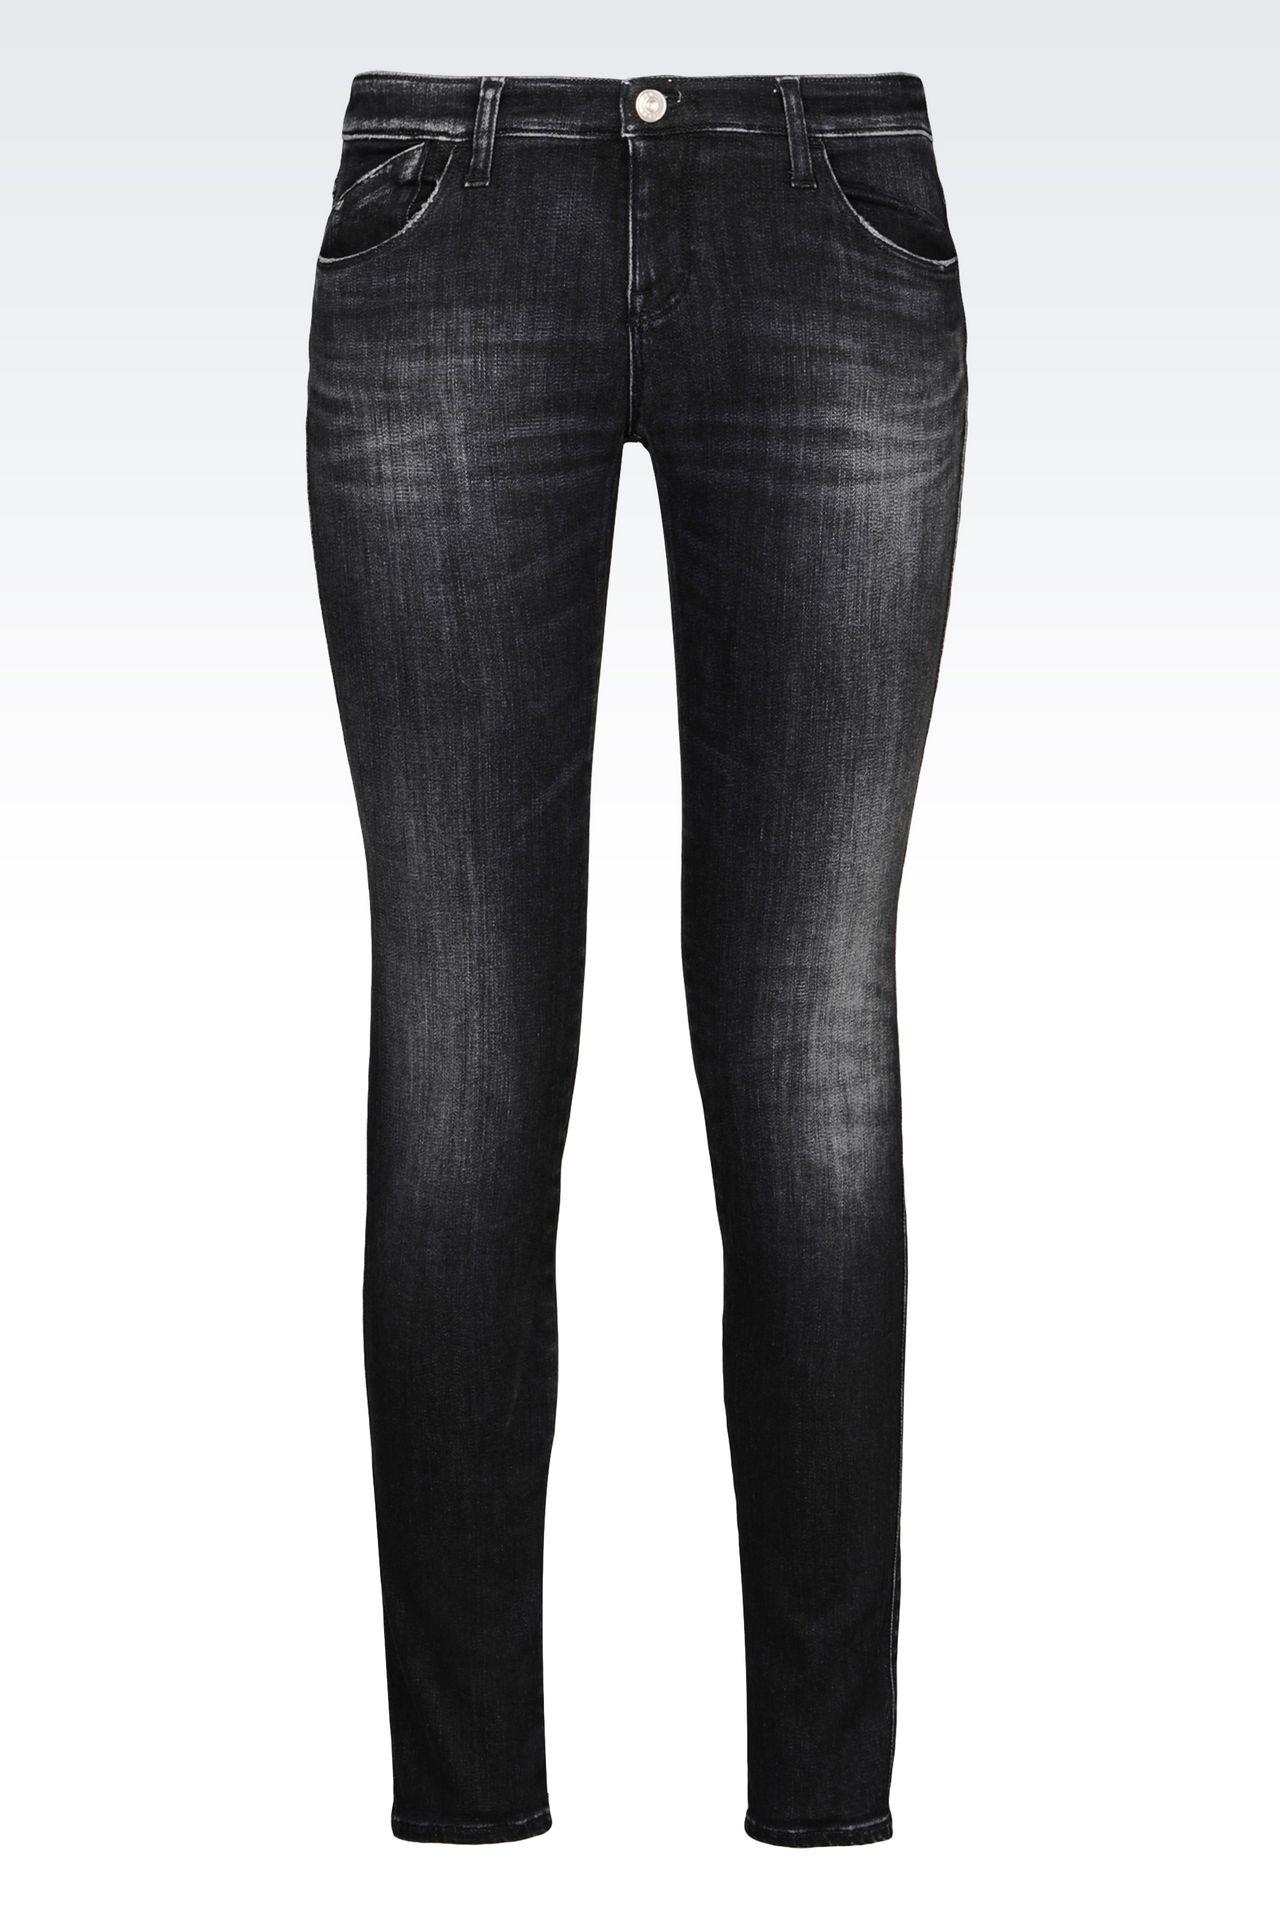 SKINNY BLACK WASH JEANS: Jeans Women by Armani - 0